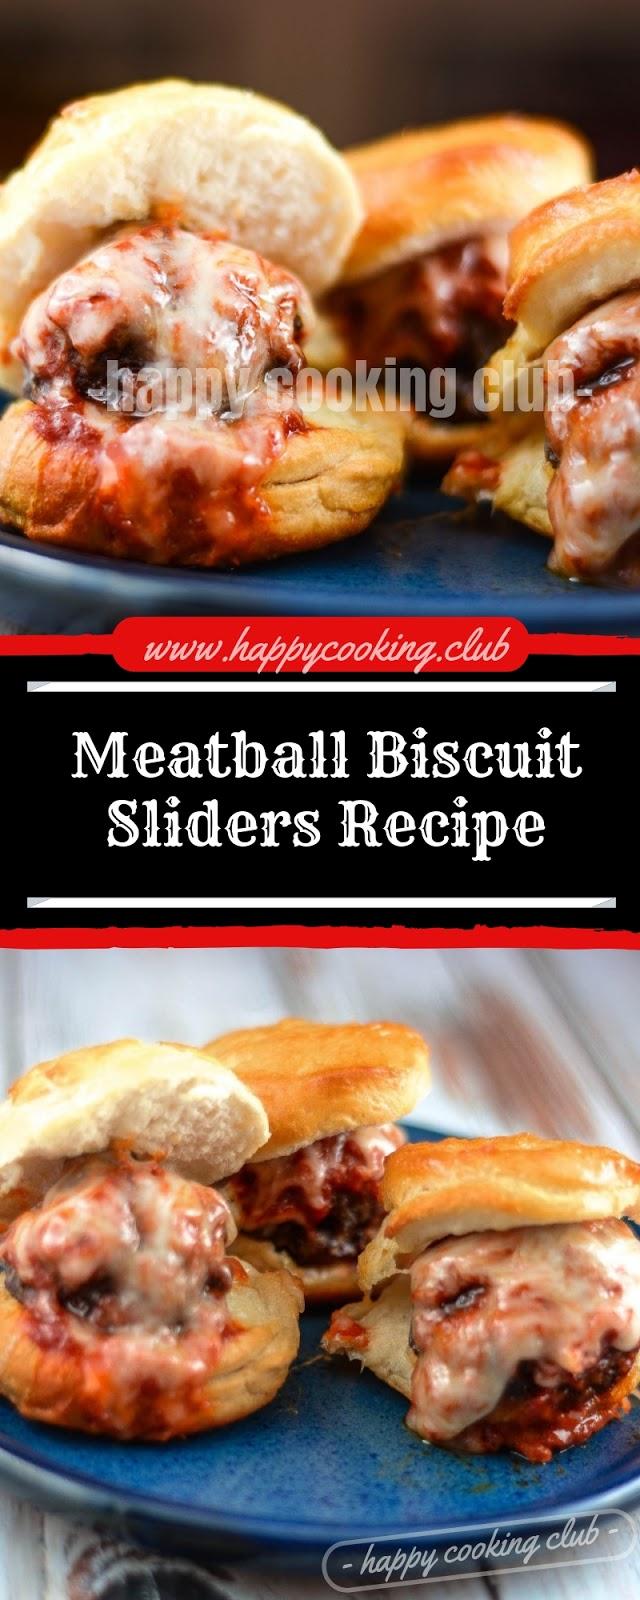 Meatball Biscuit Sliders Recipe